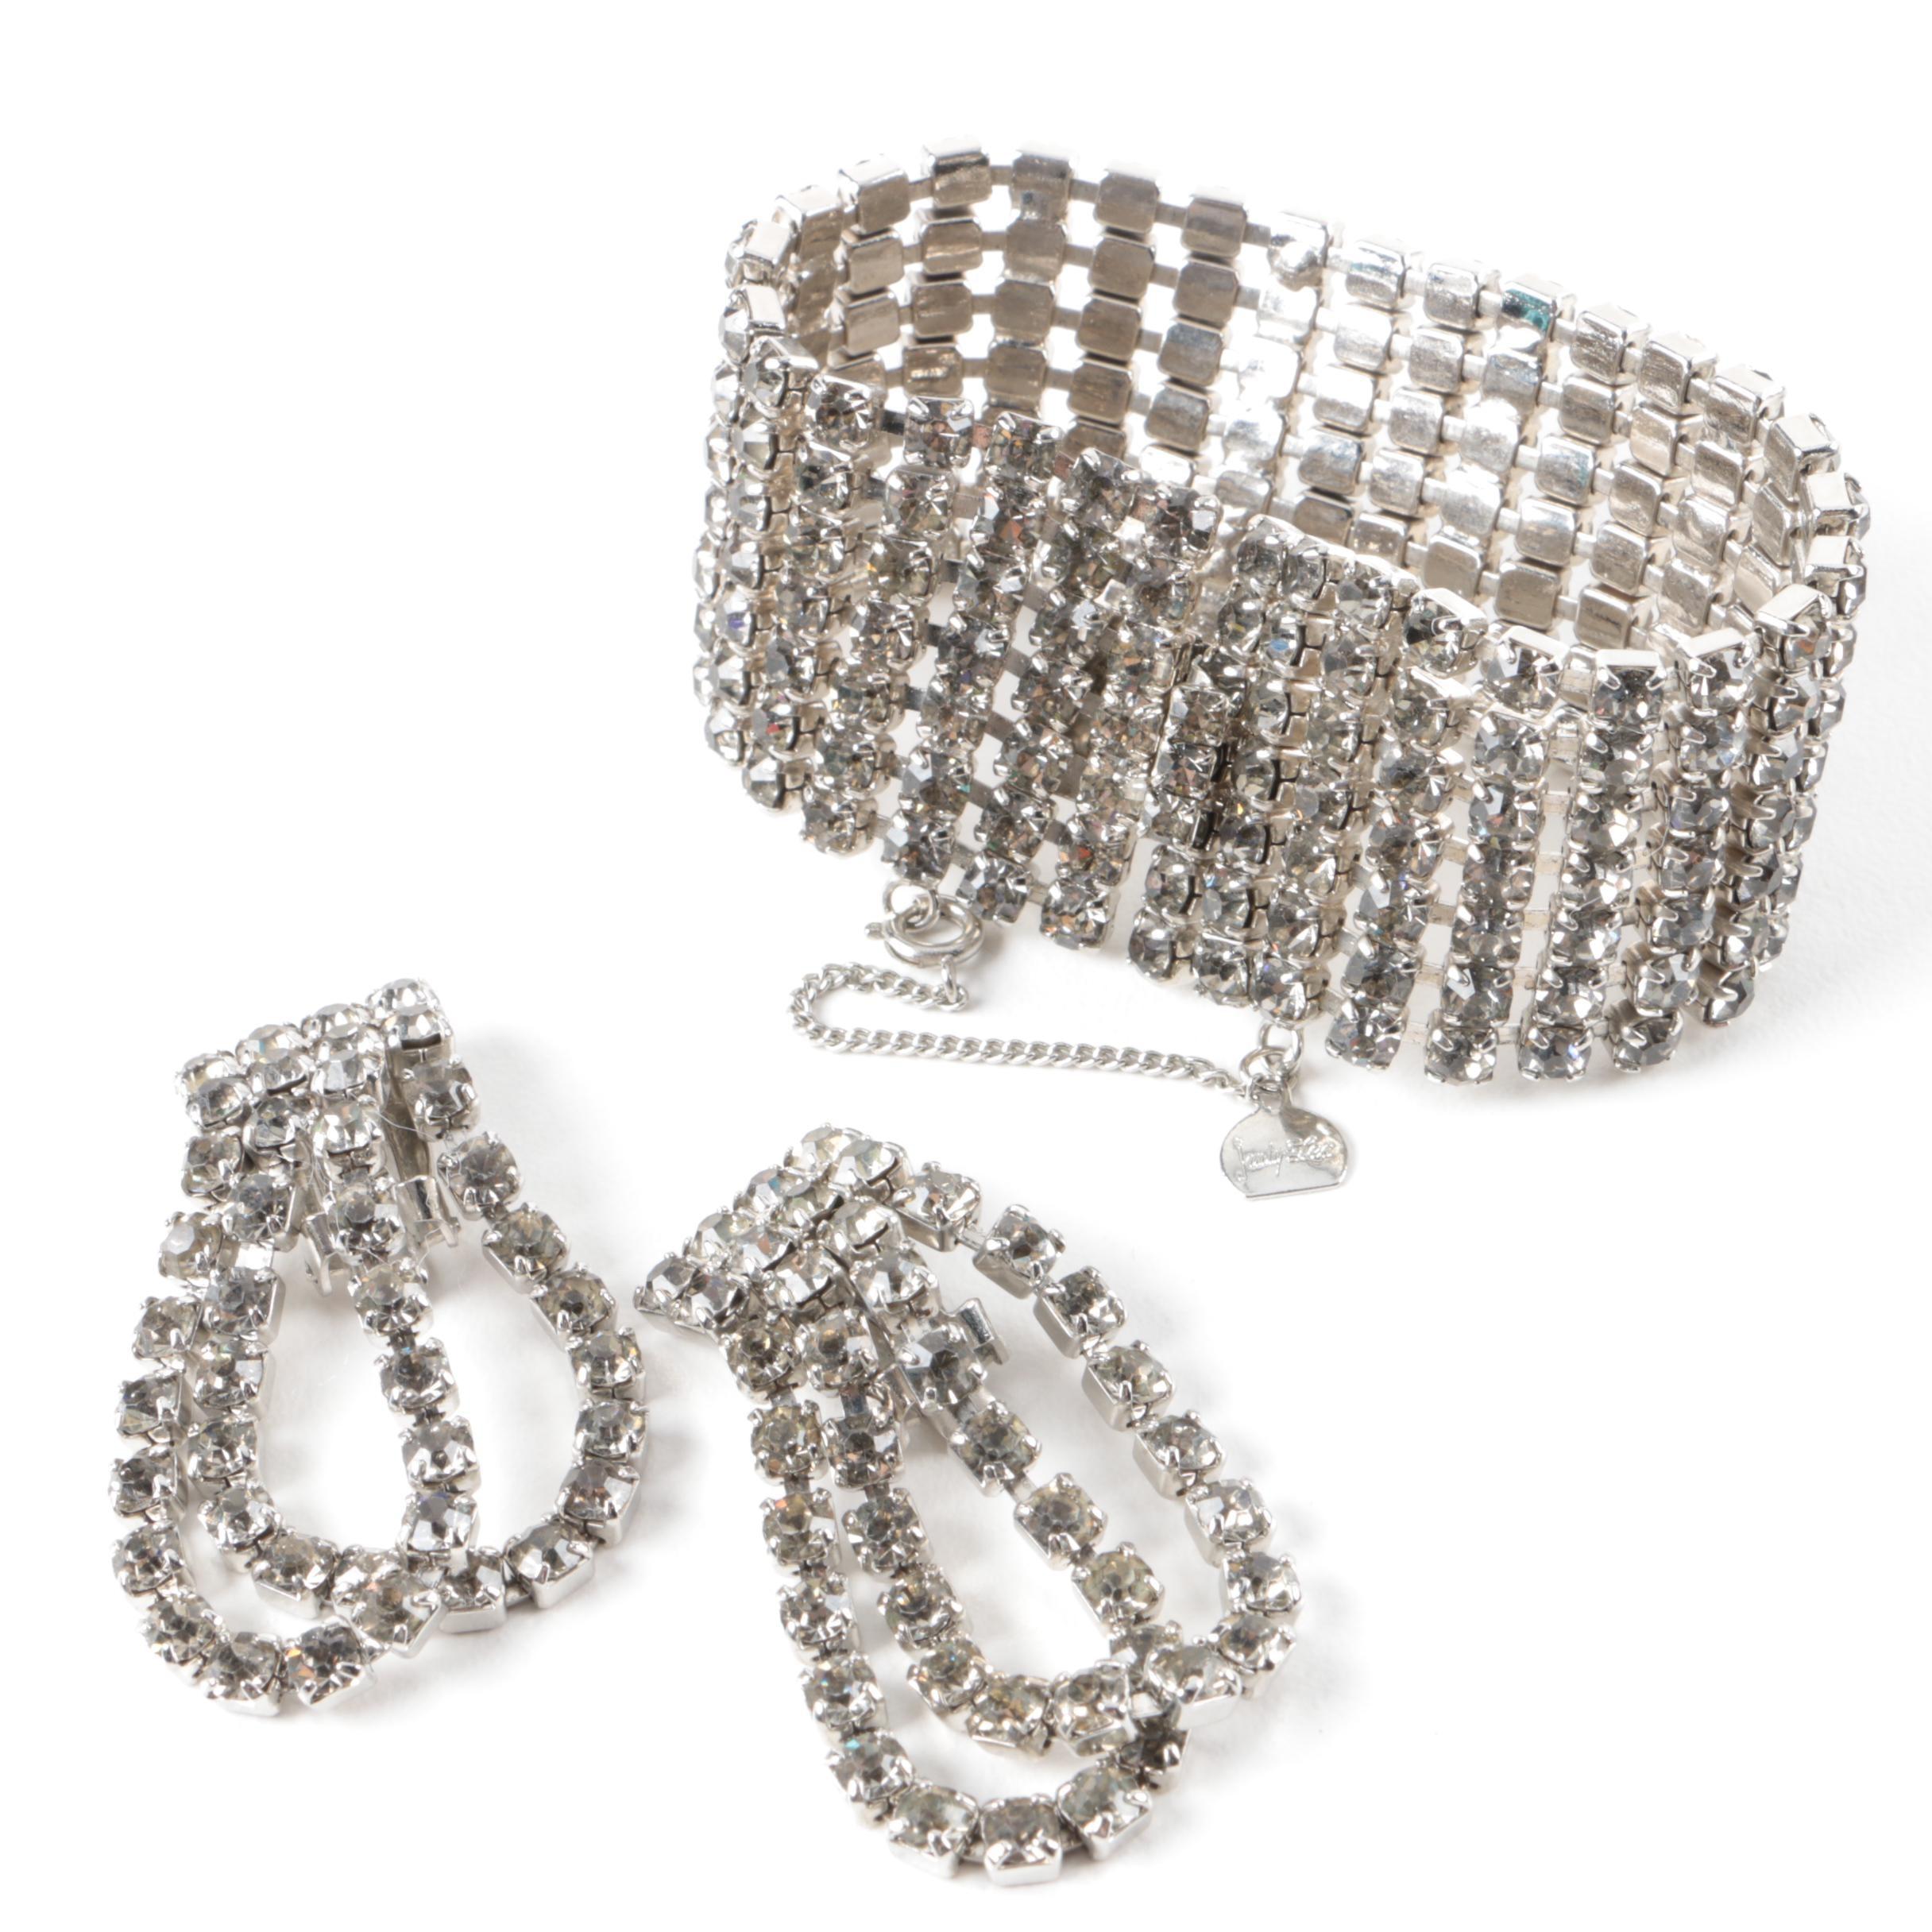 Vintage Judy Lee Silver-Tone Glass Crystal Demi Parure